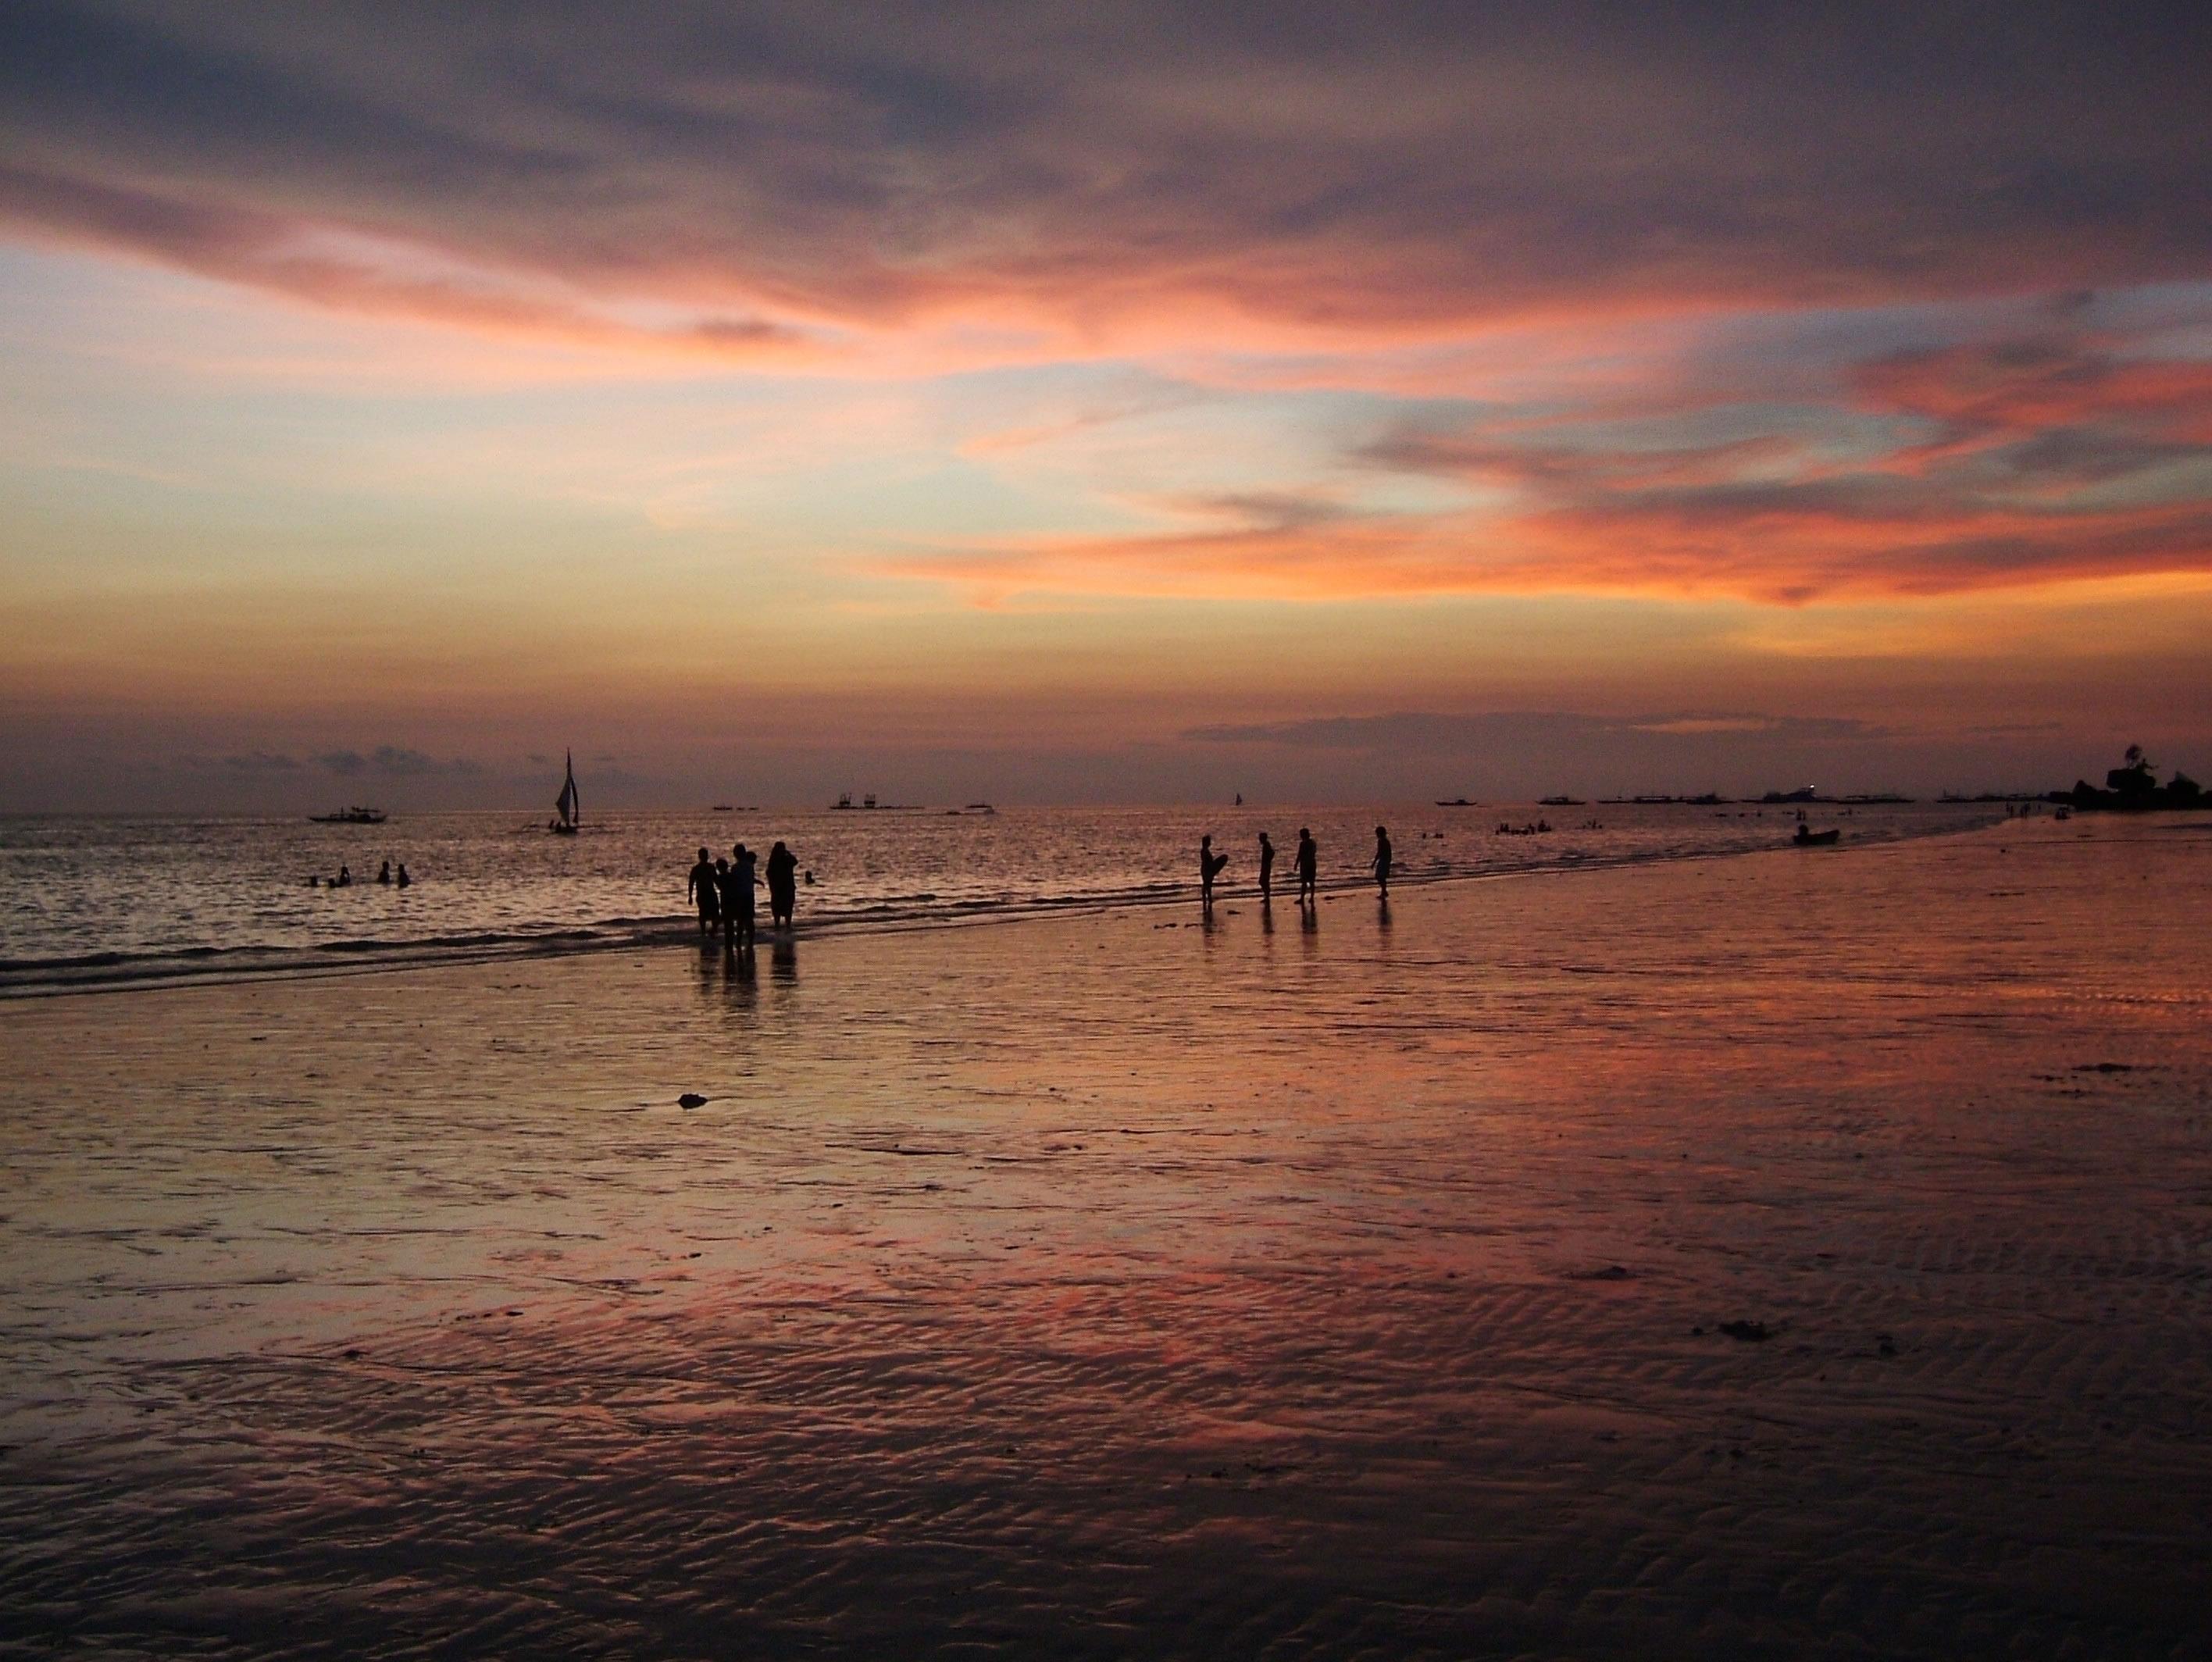 Philippines Sugar Islands Caticlan Boracay White Beach Sunset 2007 53